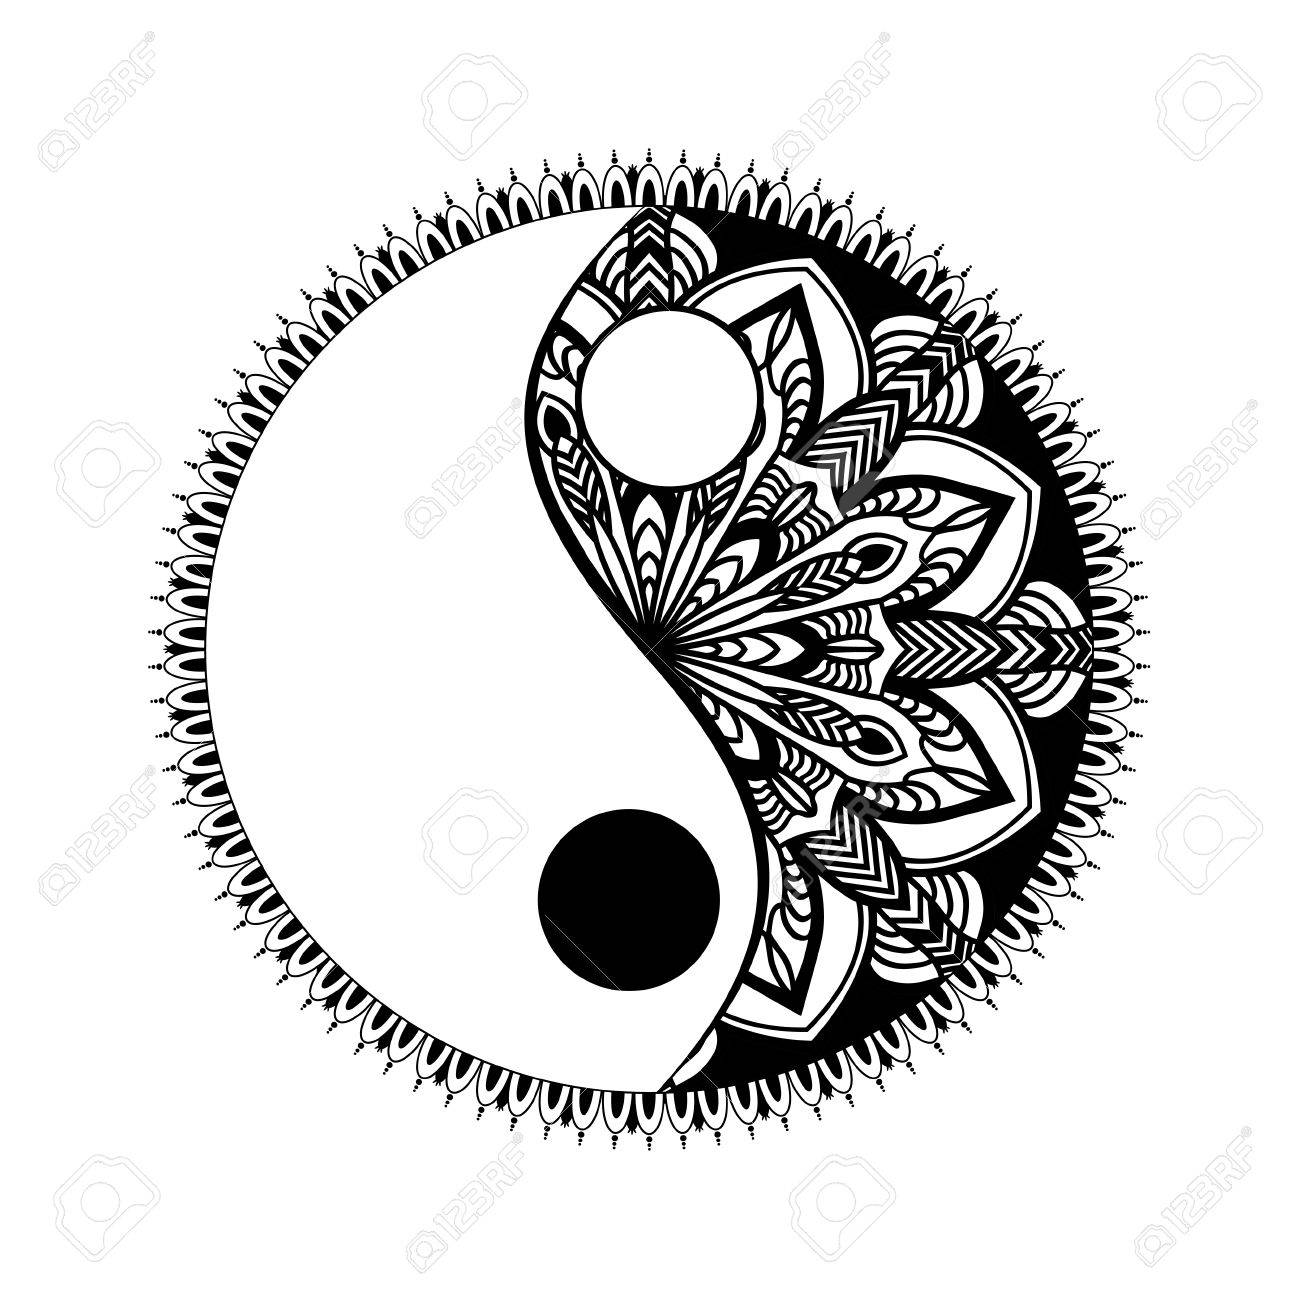 Monochrome Yin Yang Decorative Symbol Hand Drawn Vintage Style